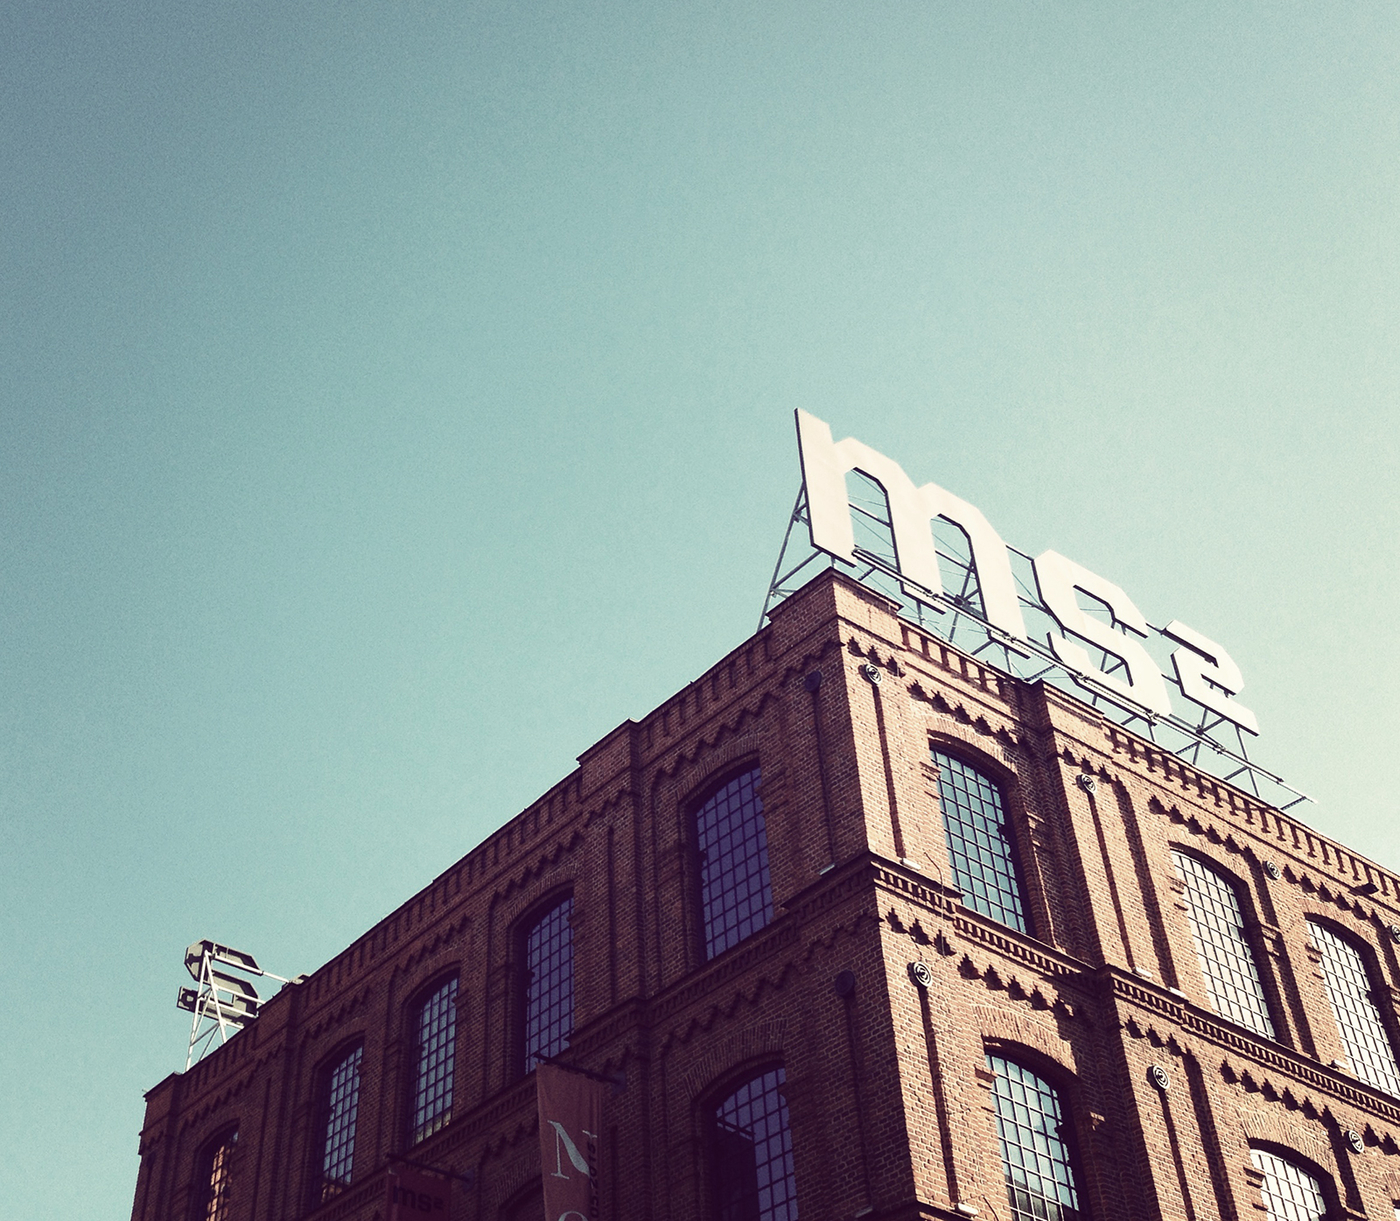 Lodz factories 2 blog.jpg